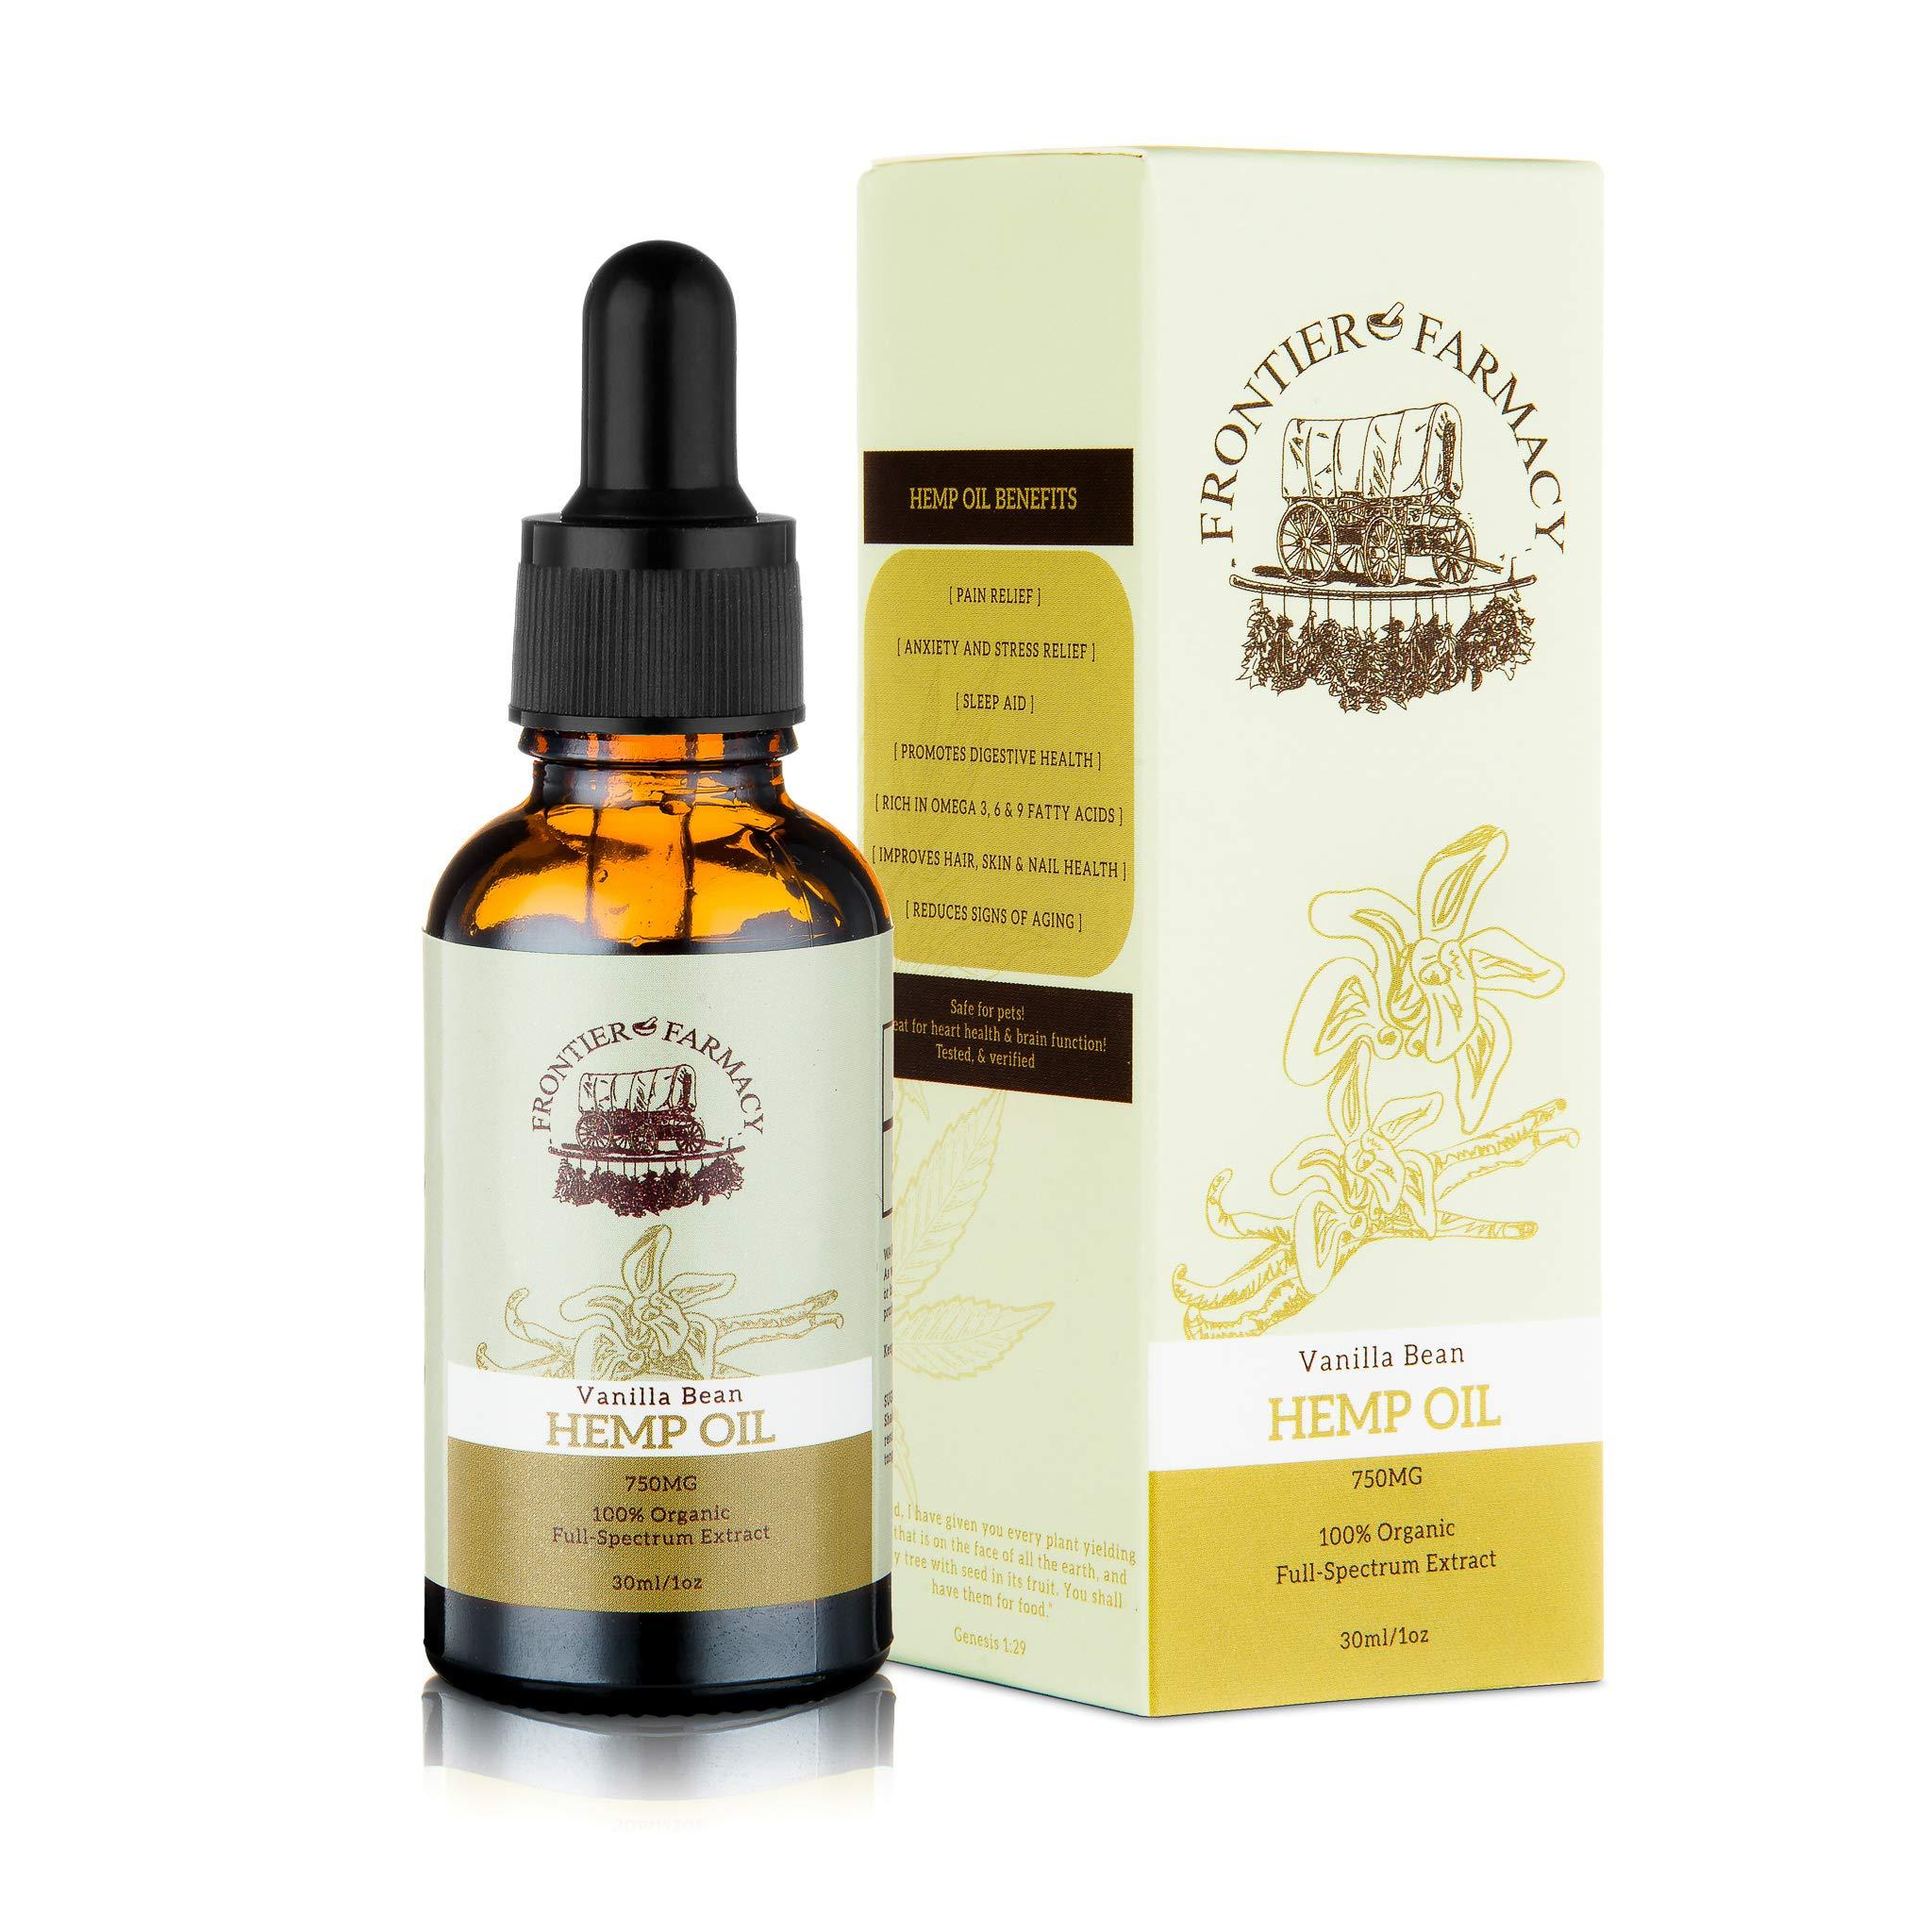 Frontier Farmacy Organic Hemp Oil - 750mg Pure Extract Vanilla Bean